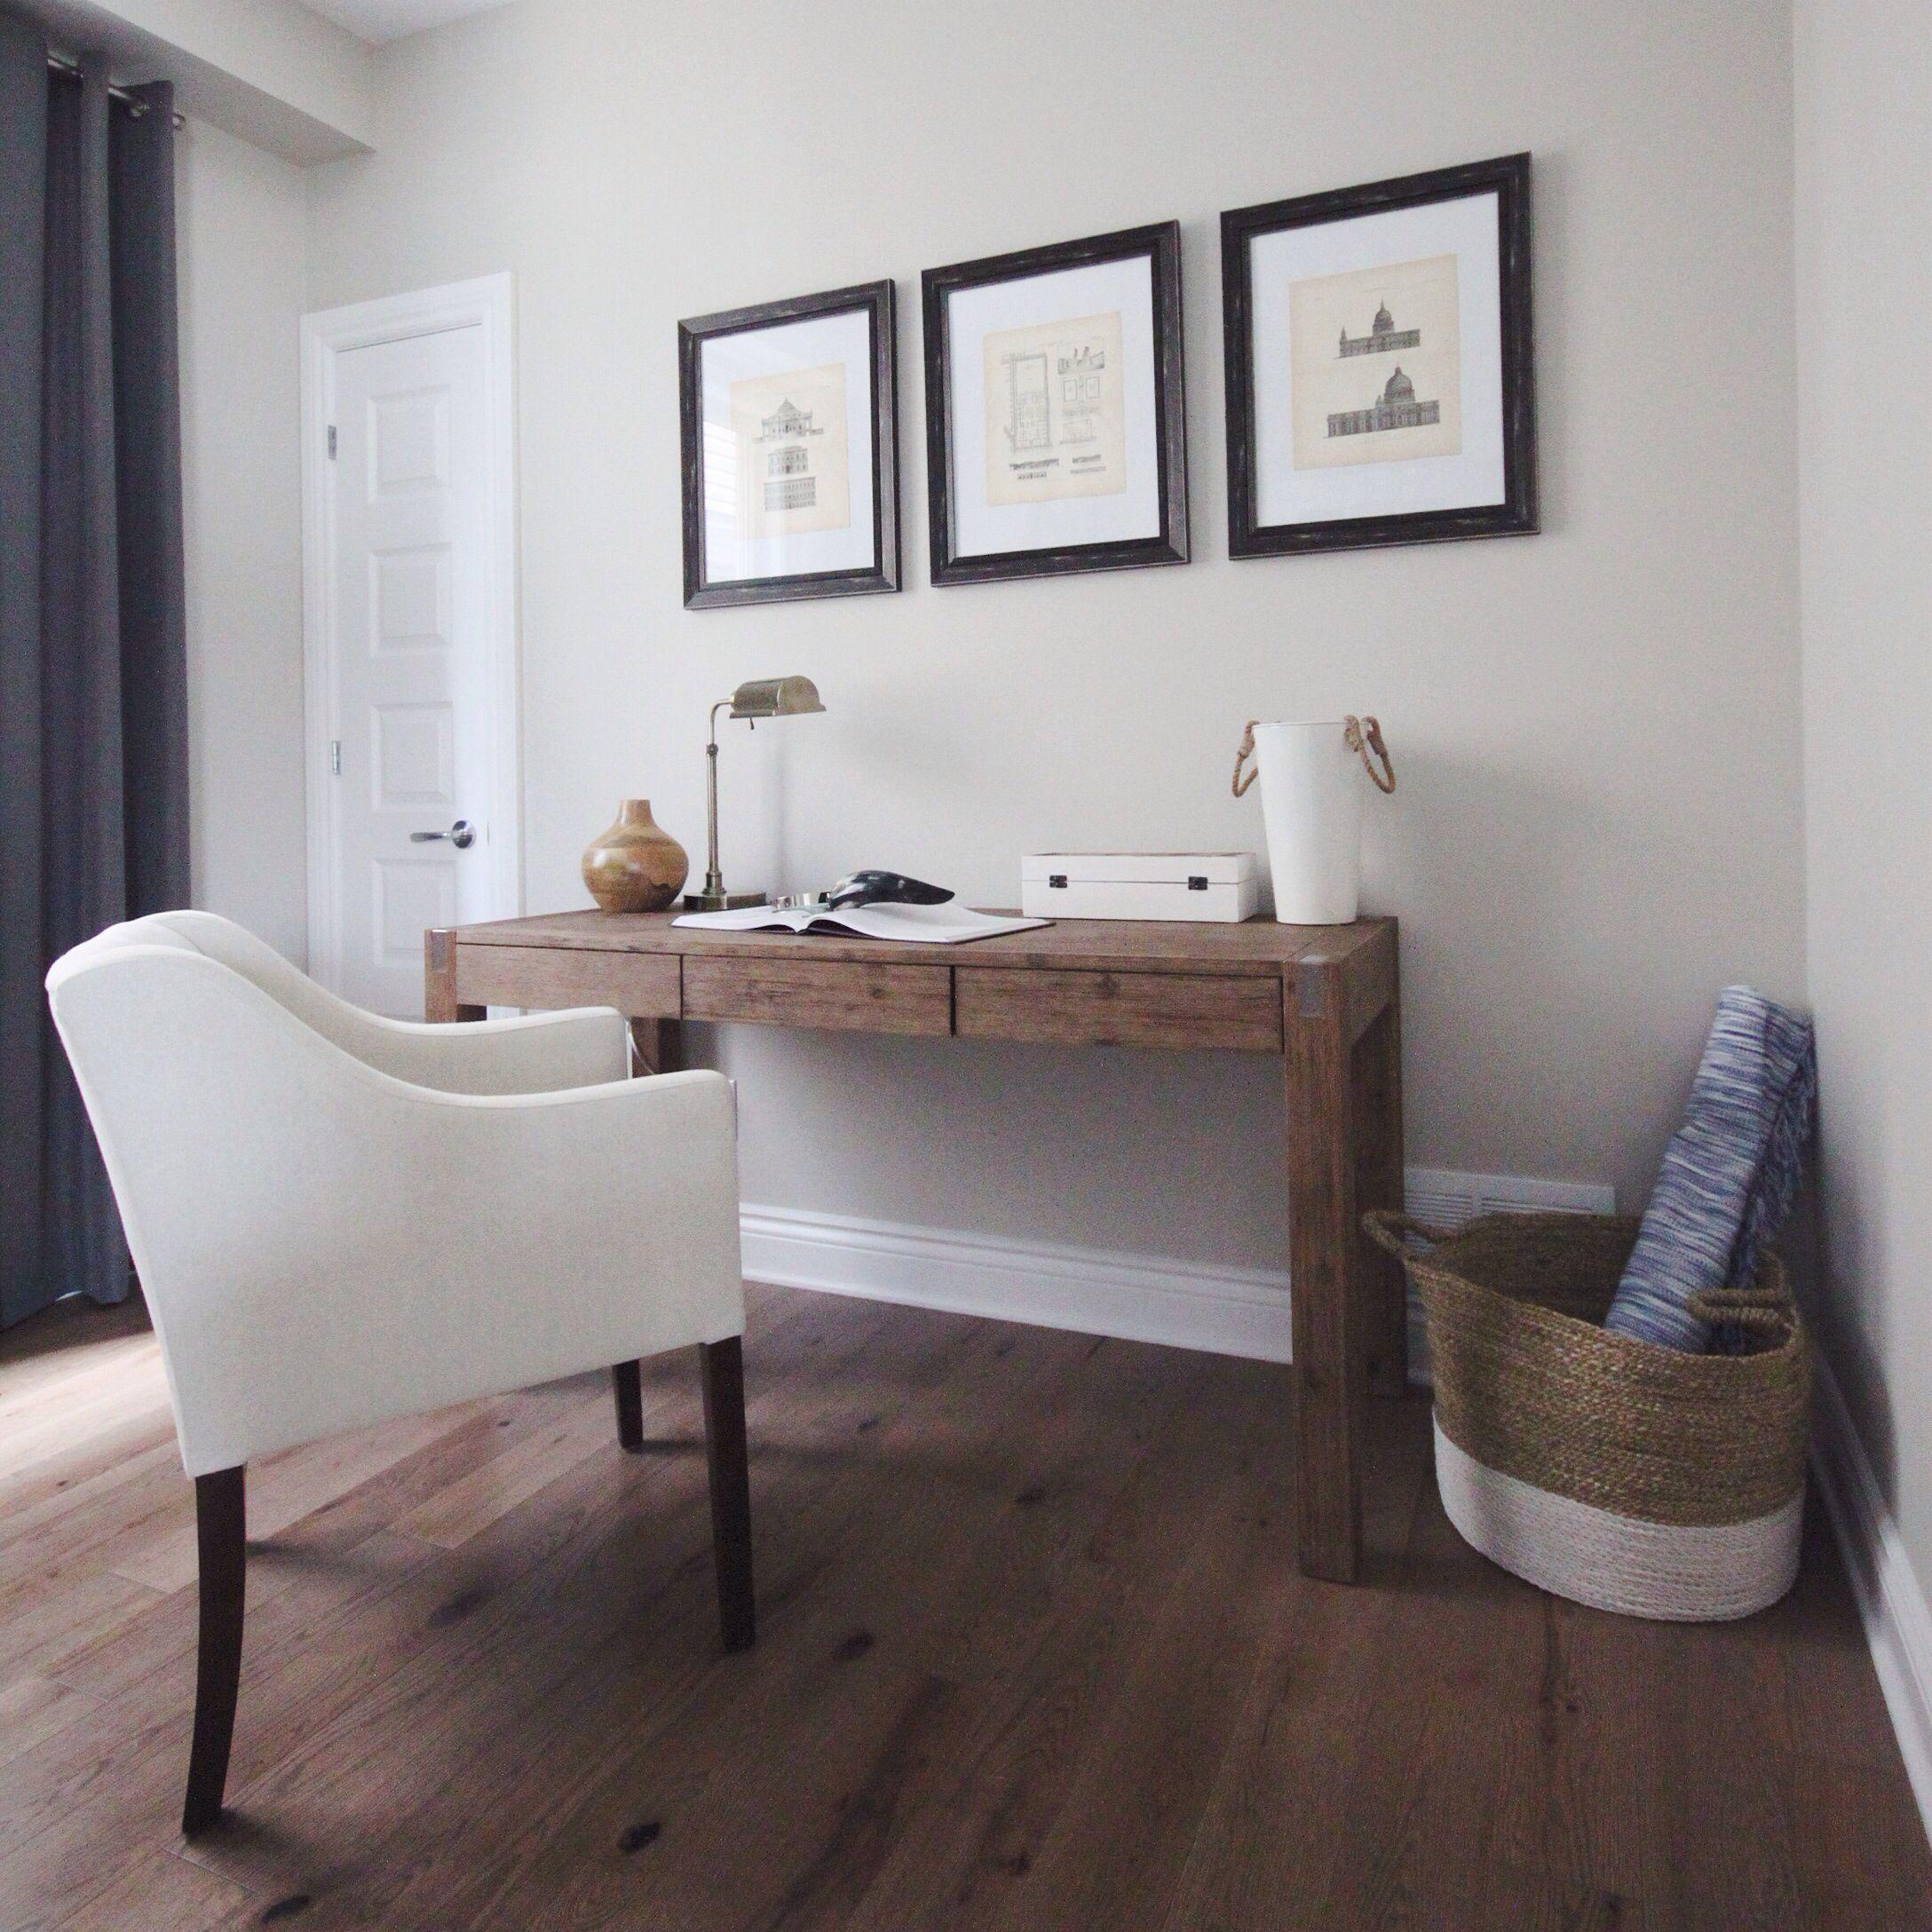 Richcraft Dellwood Model Office In Fernbank Crossing Chair And Desk